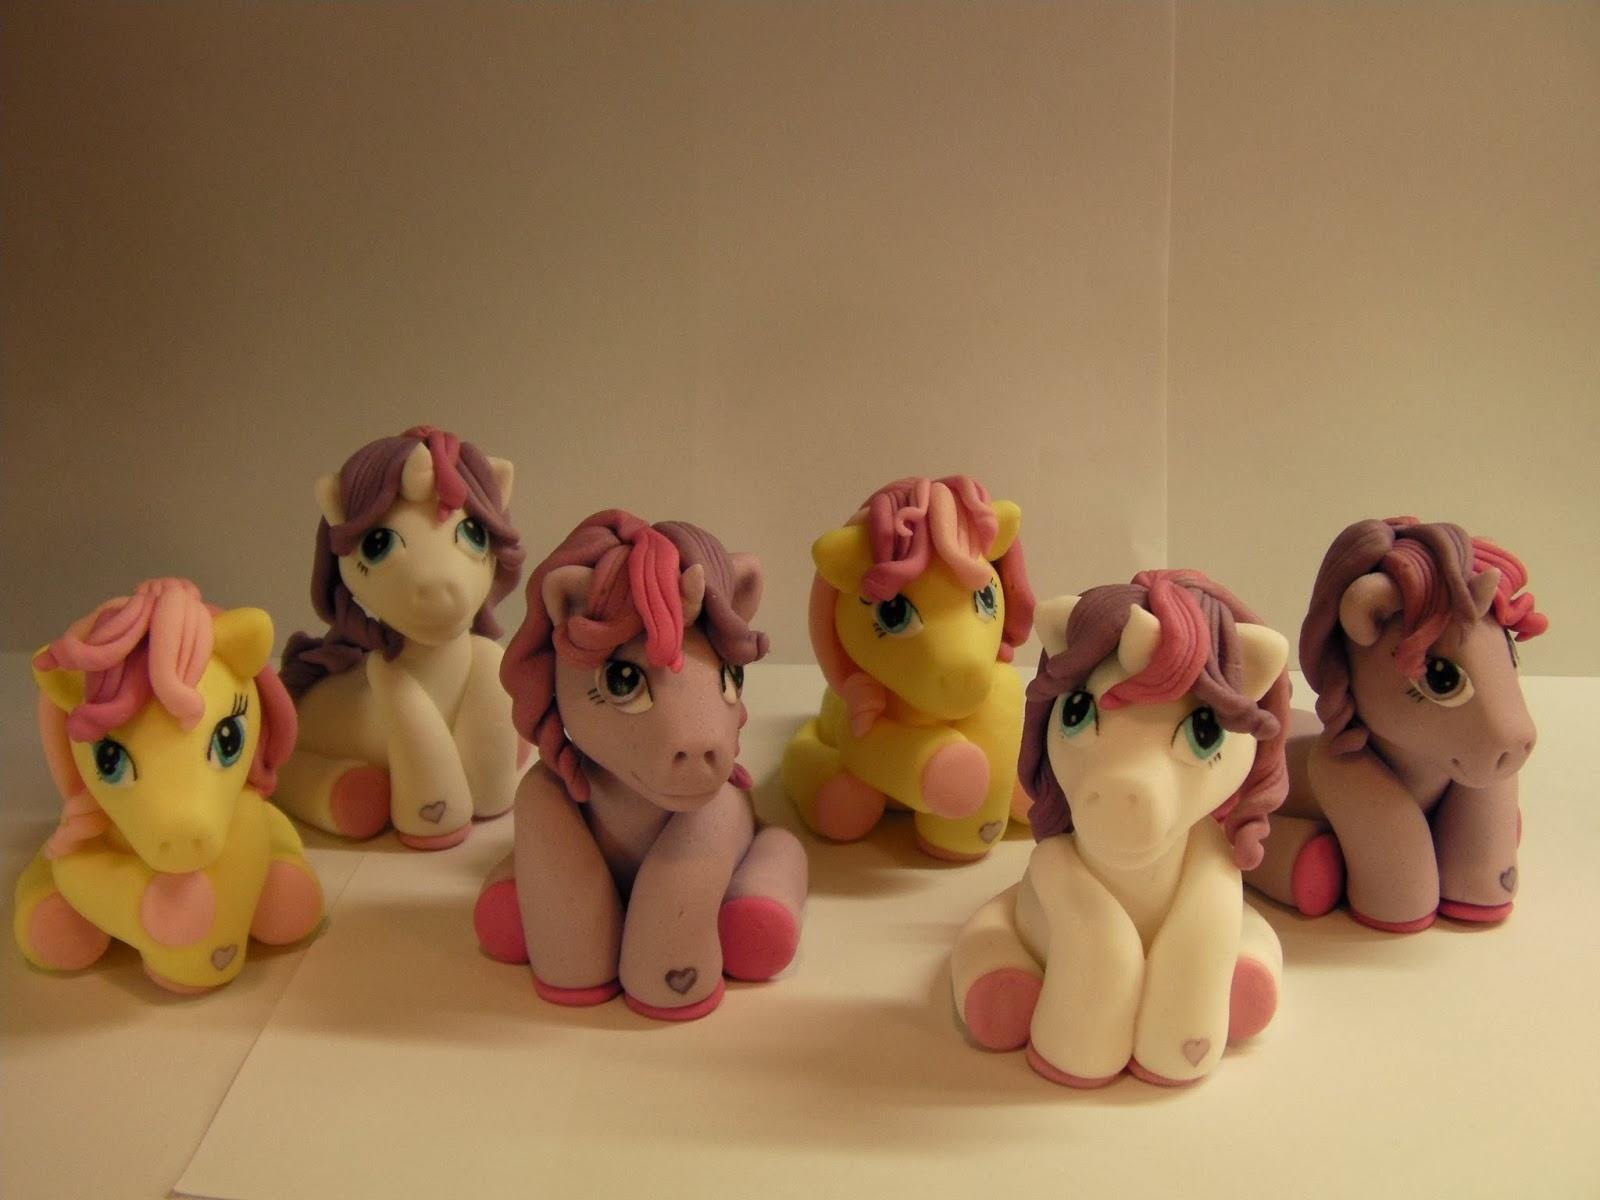 my little pony moj mali poni fondant figures princess celestia luna little pony. Black Bedroom Furniture Sets. Home Design Ideas